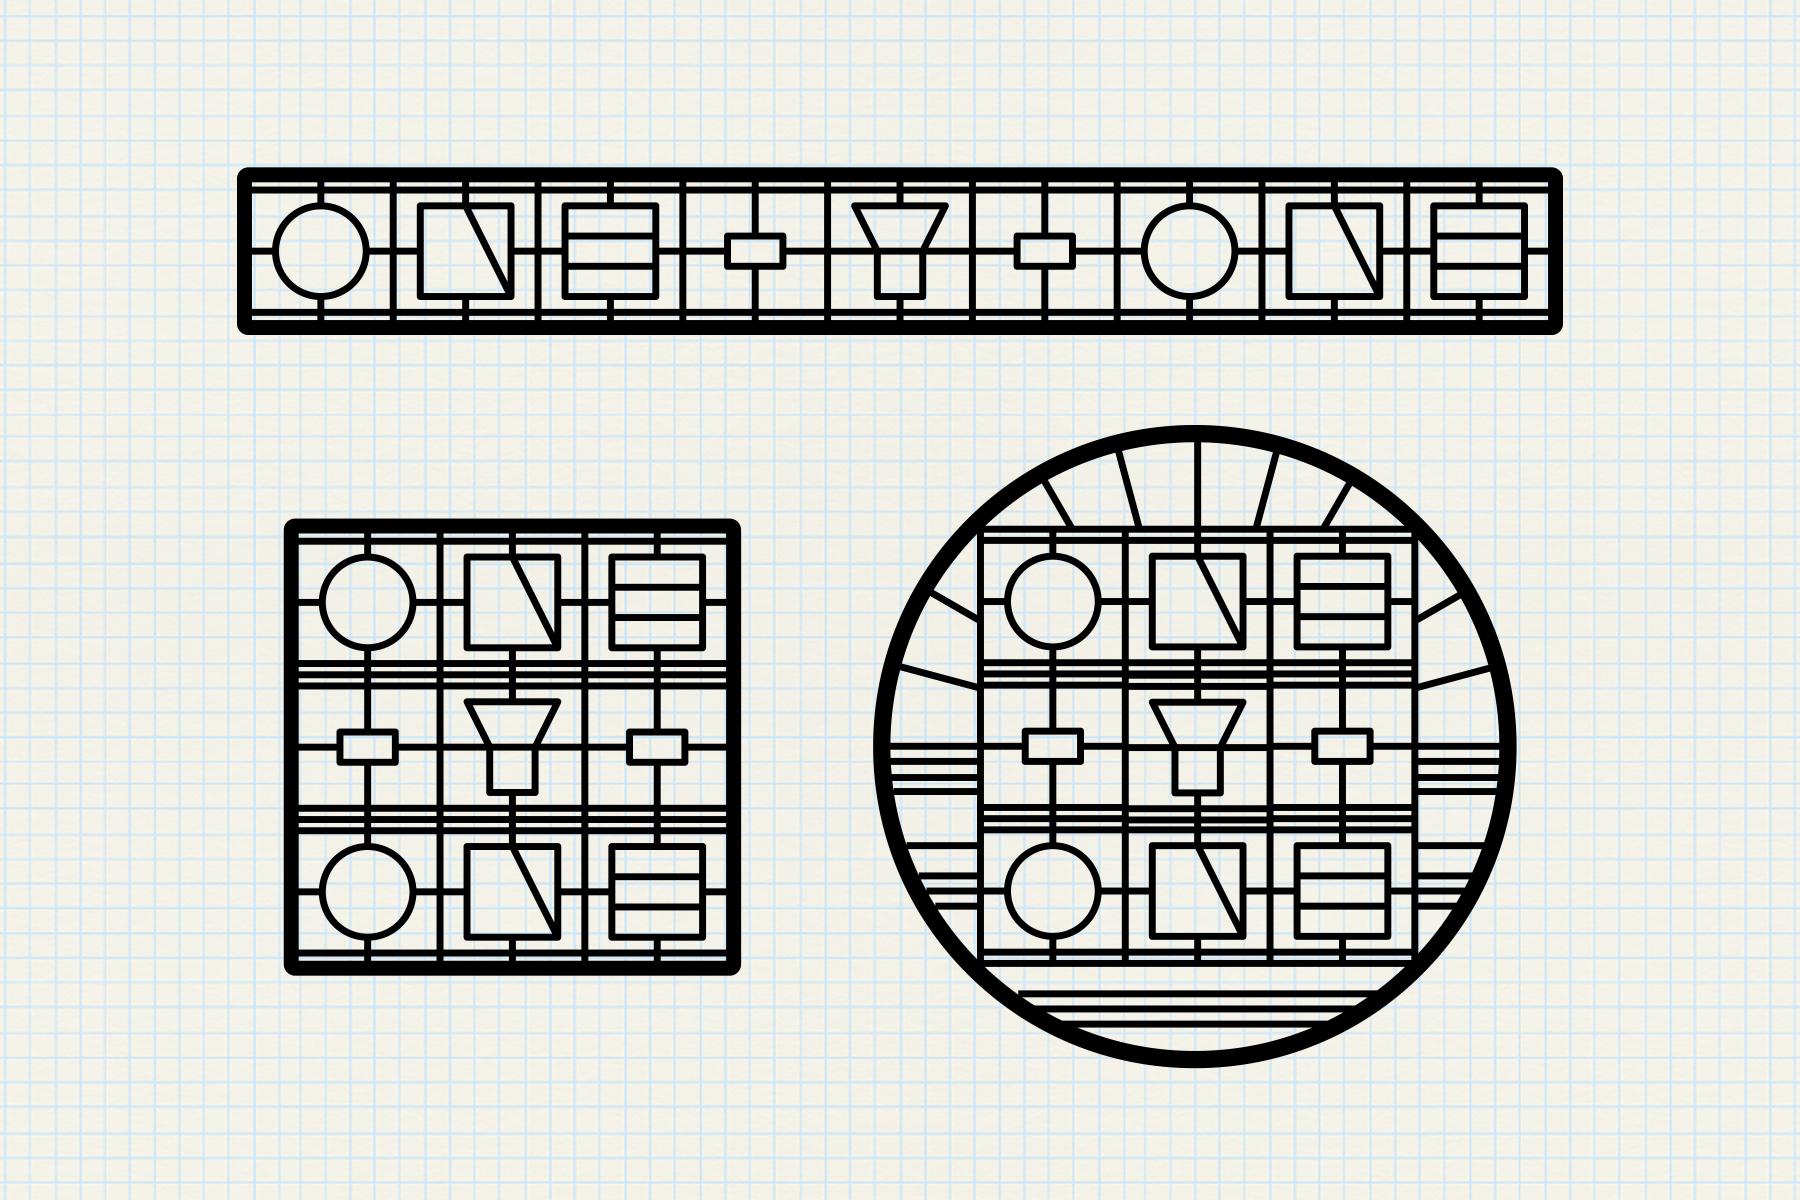 oneyone-behindtheprocess-logooptions.jpg